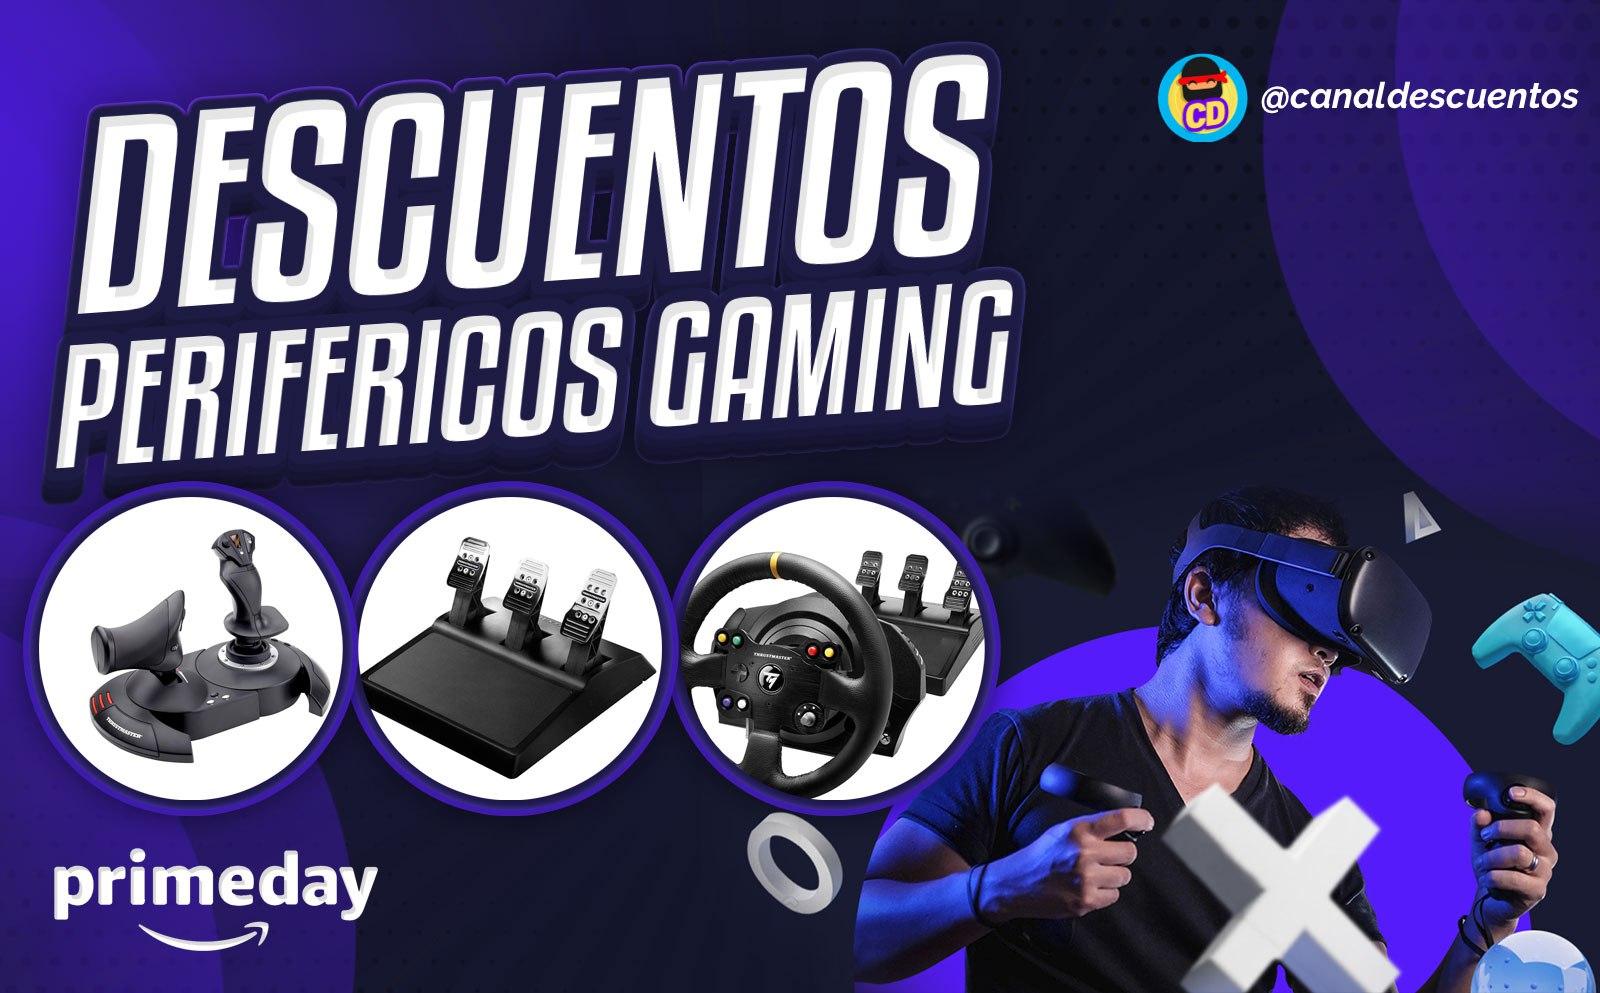 Descuentos en periféricos gaming en Prime Day